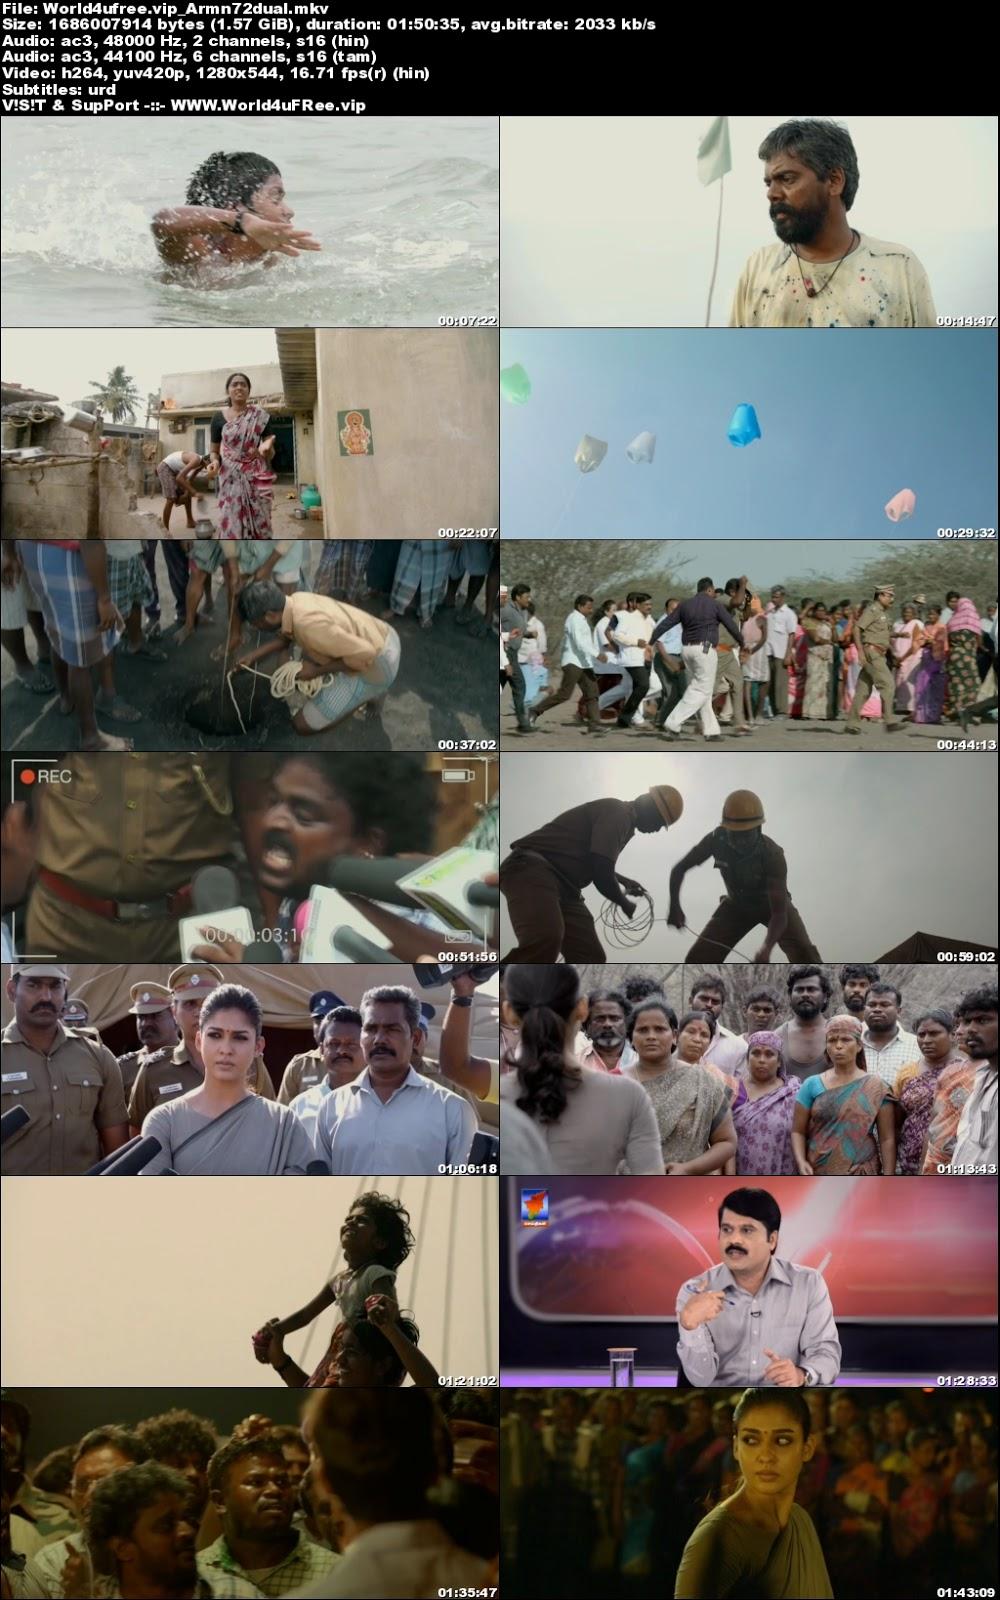 Aramm 2017 Dual Audio 720p UNCUT HDRip Download x264 world4ufree.vip , South indian movie Aramm 2017 2018 hindi dubbed world4ufree.vip 720p hdrip webrip dvdrip 700mb brrip bluray free download or watch online at world4ufree.vip